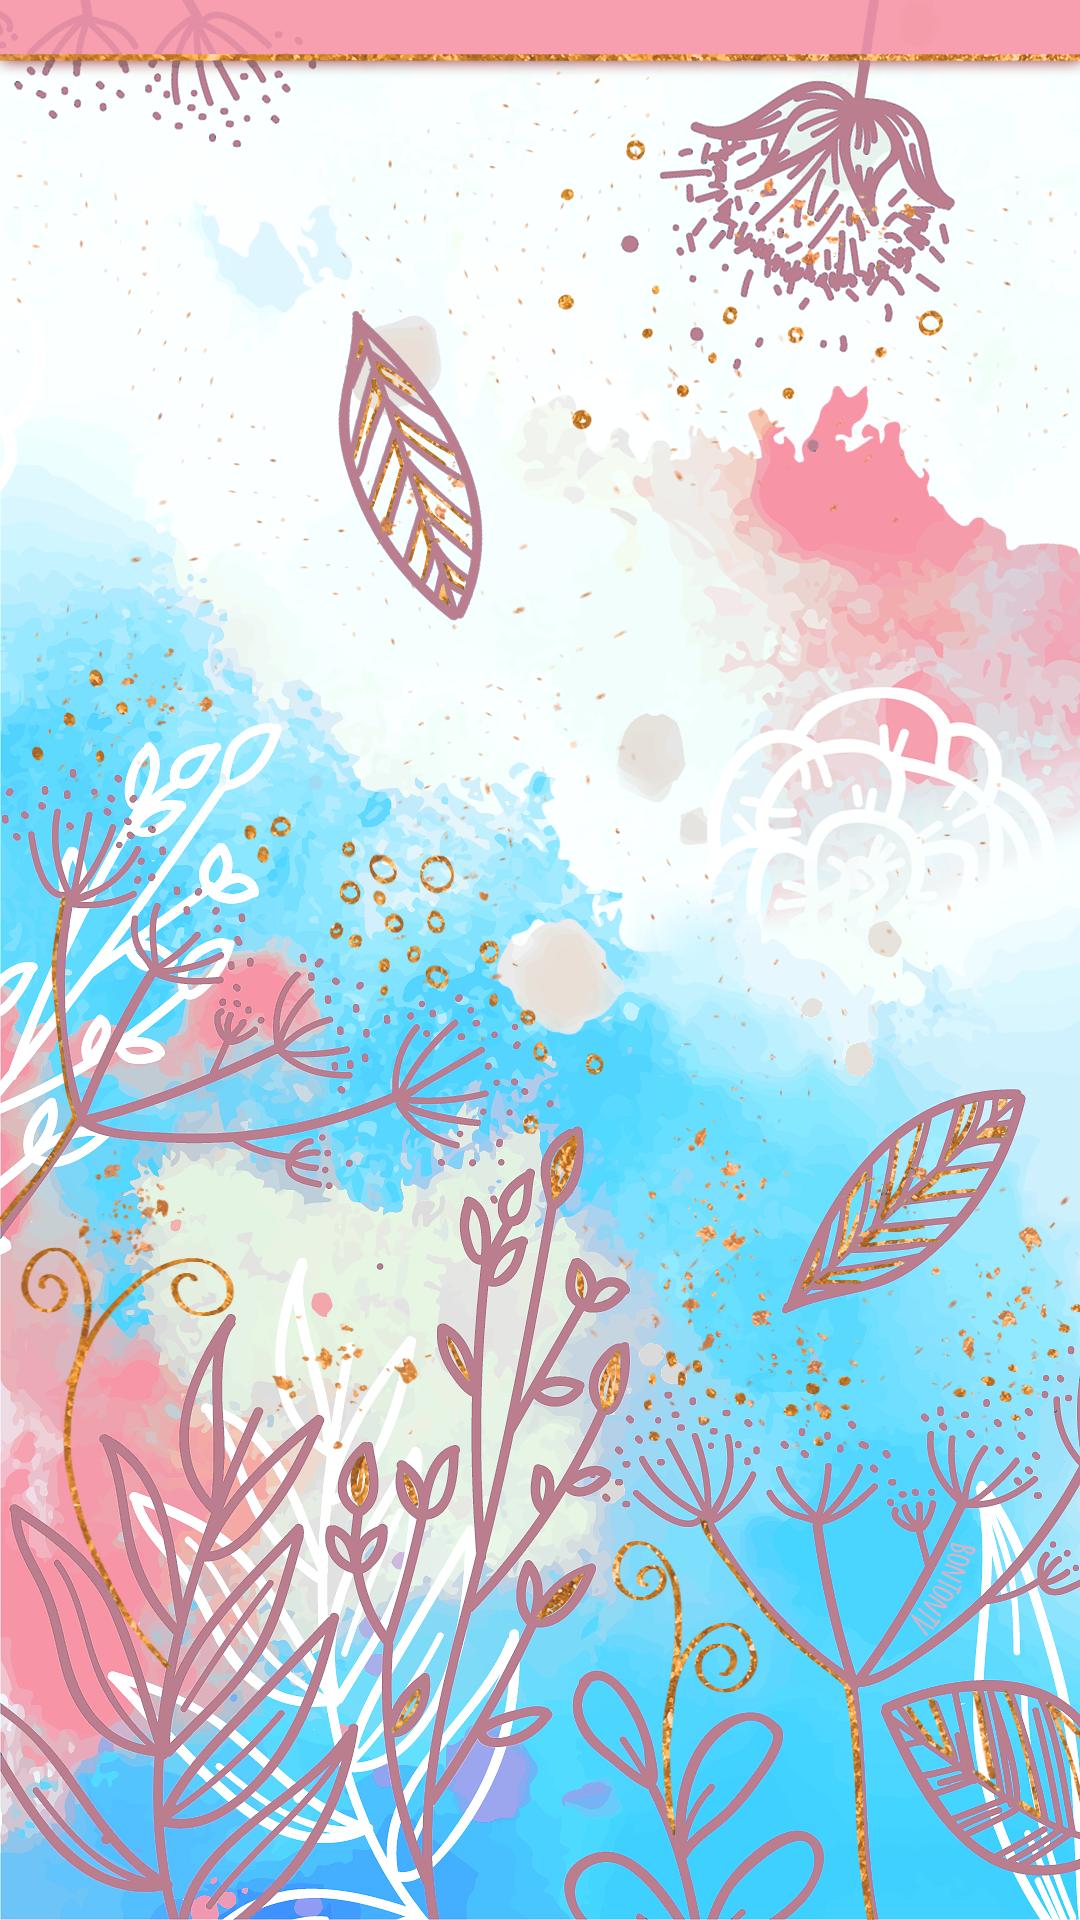 Hd Phone Wallpapers By Bonton Tv Free Backgrounds 1080x1920 Wallpapers Iphone Smartphone Here Y Hd Phone Wallpapers Free Phone Wallpaper Phone Wallpaper